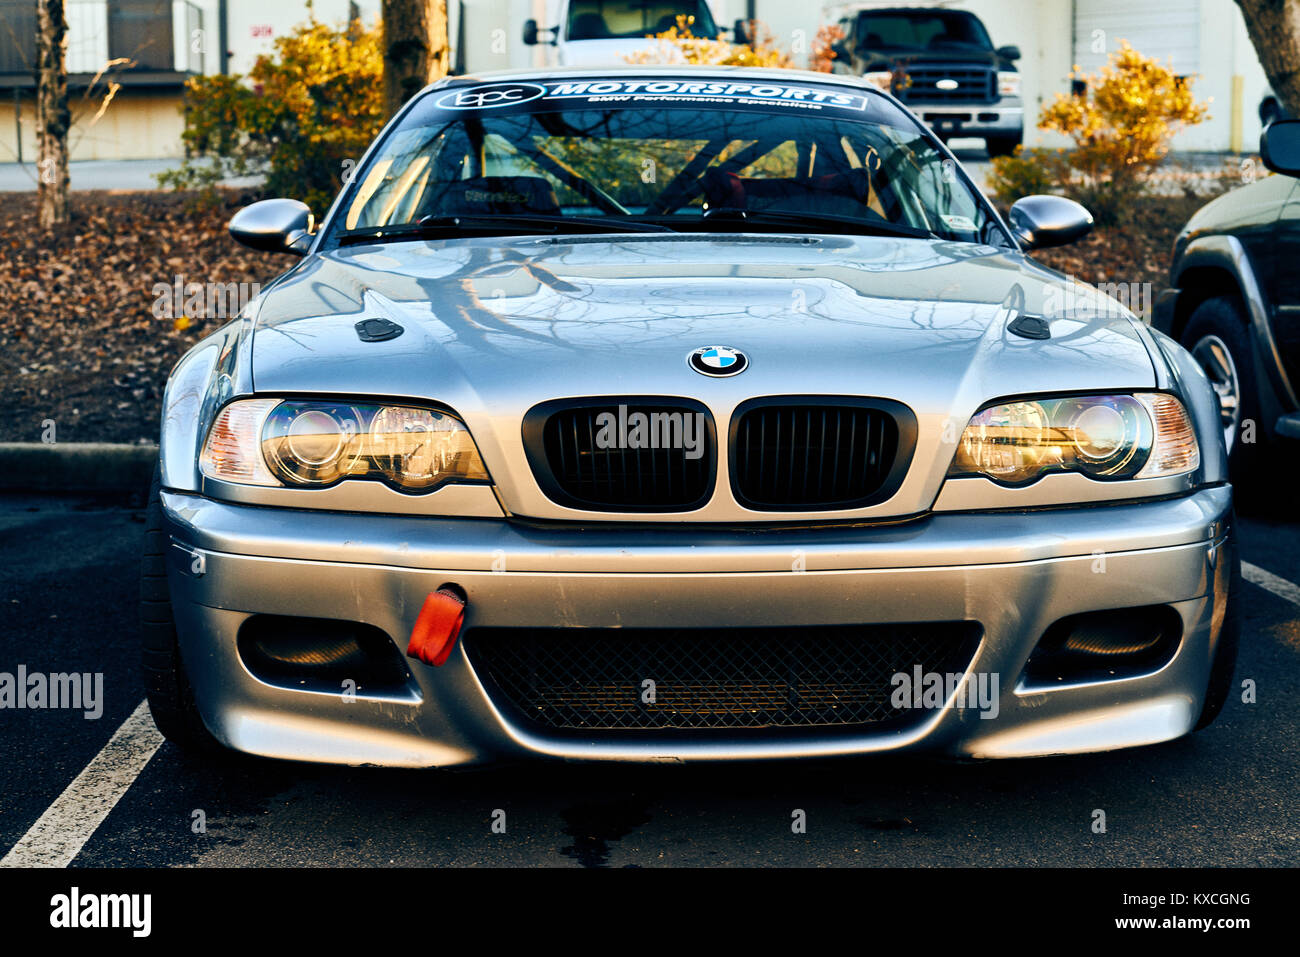 Bmw E46 M3 Track Car Stock Photo 171150940 Alamy